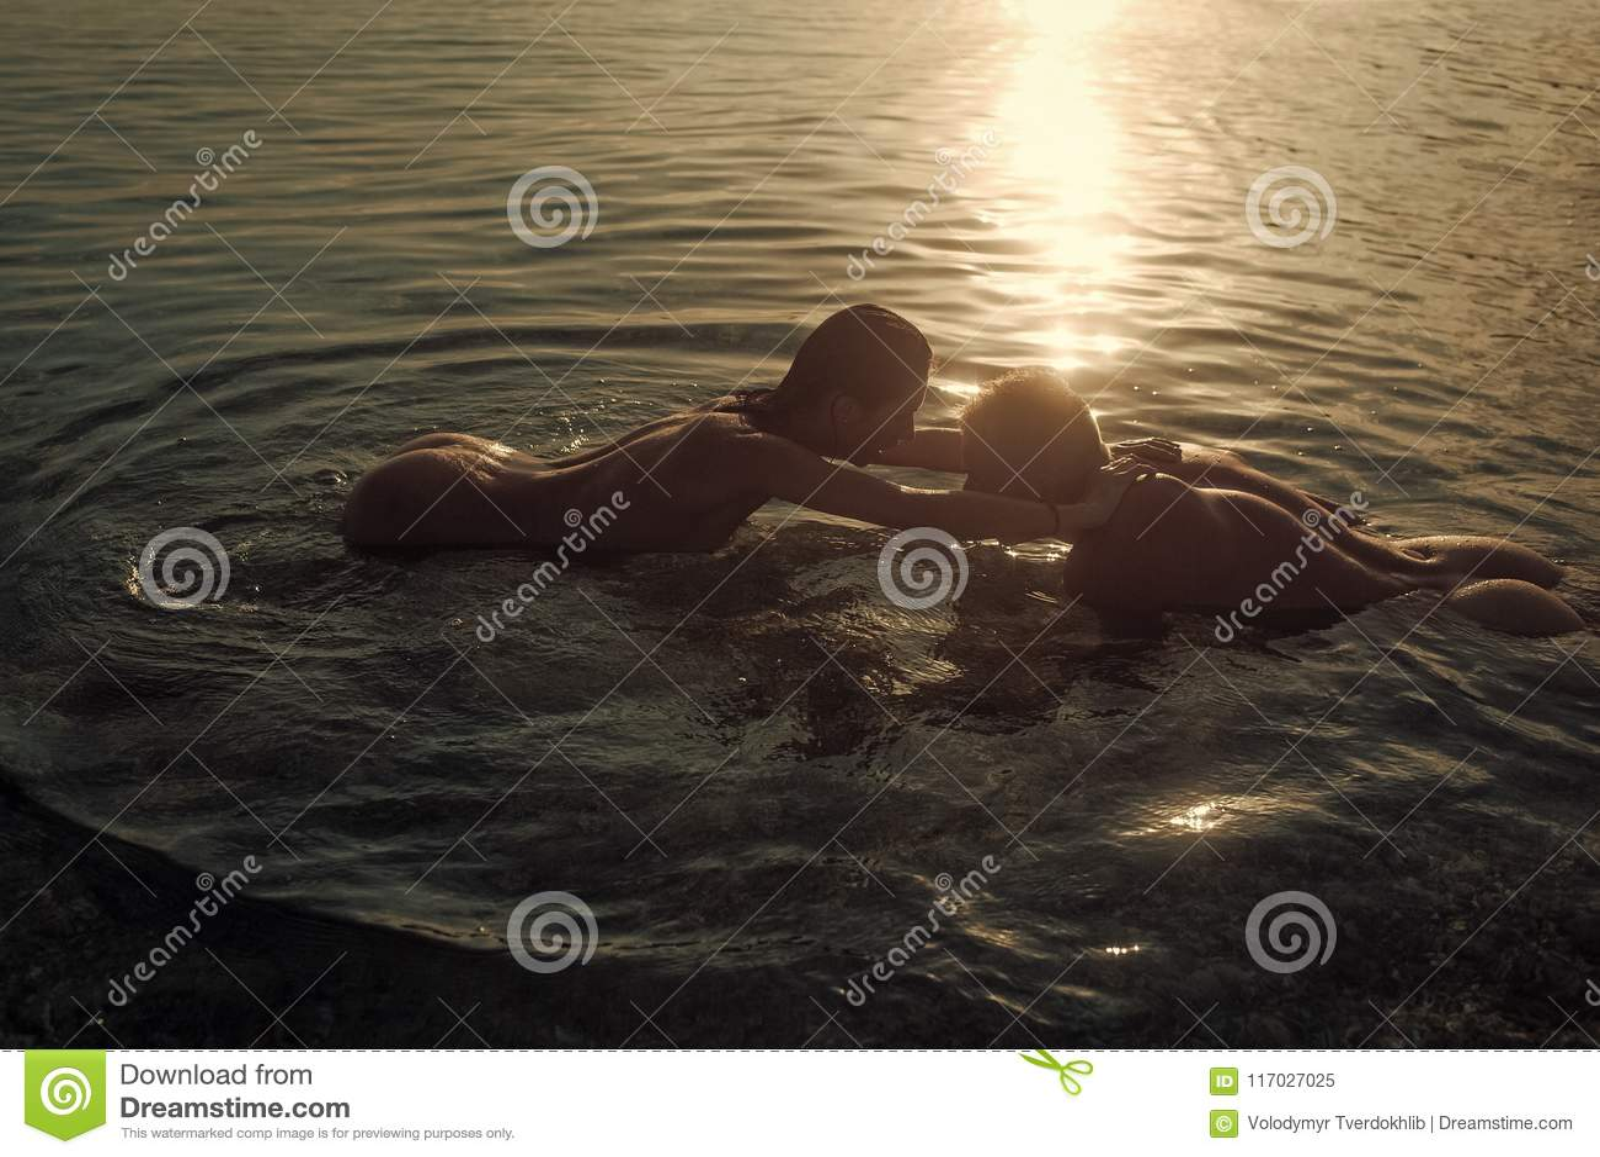 Authoritative nude couple pic on the water interesting idea